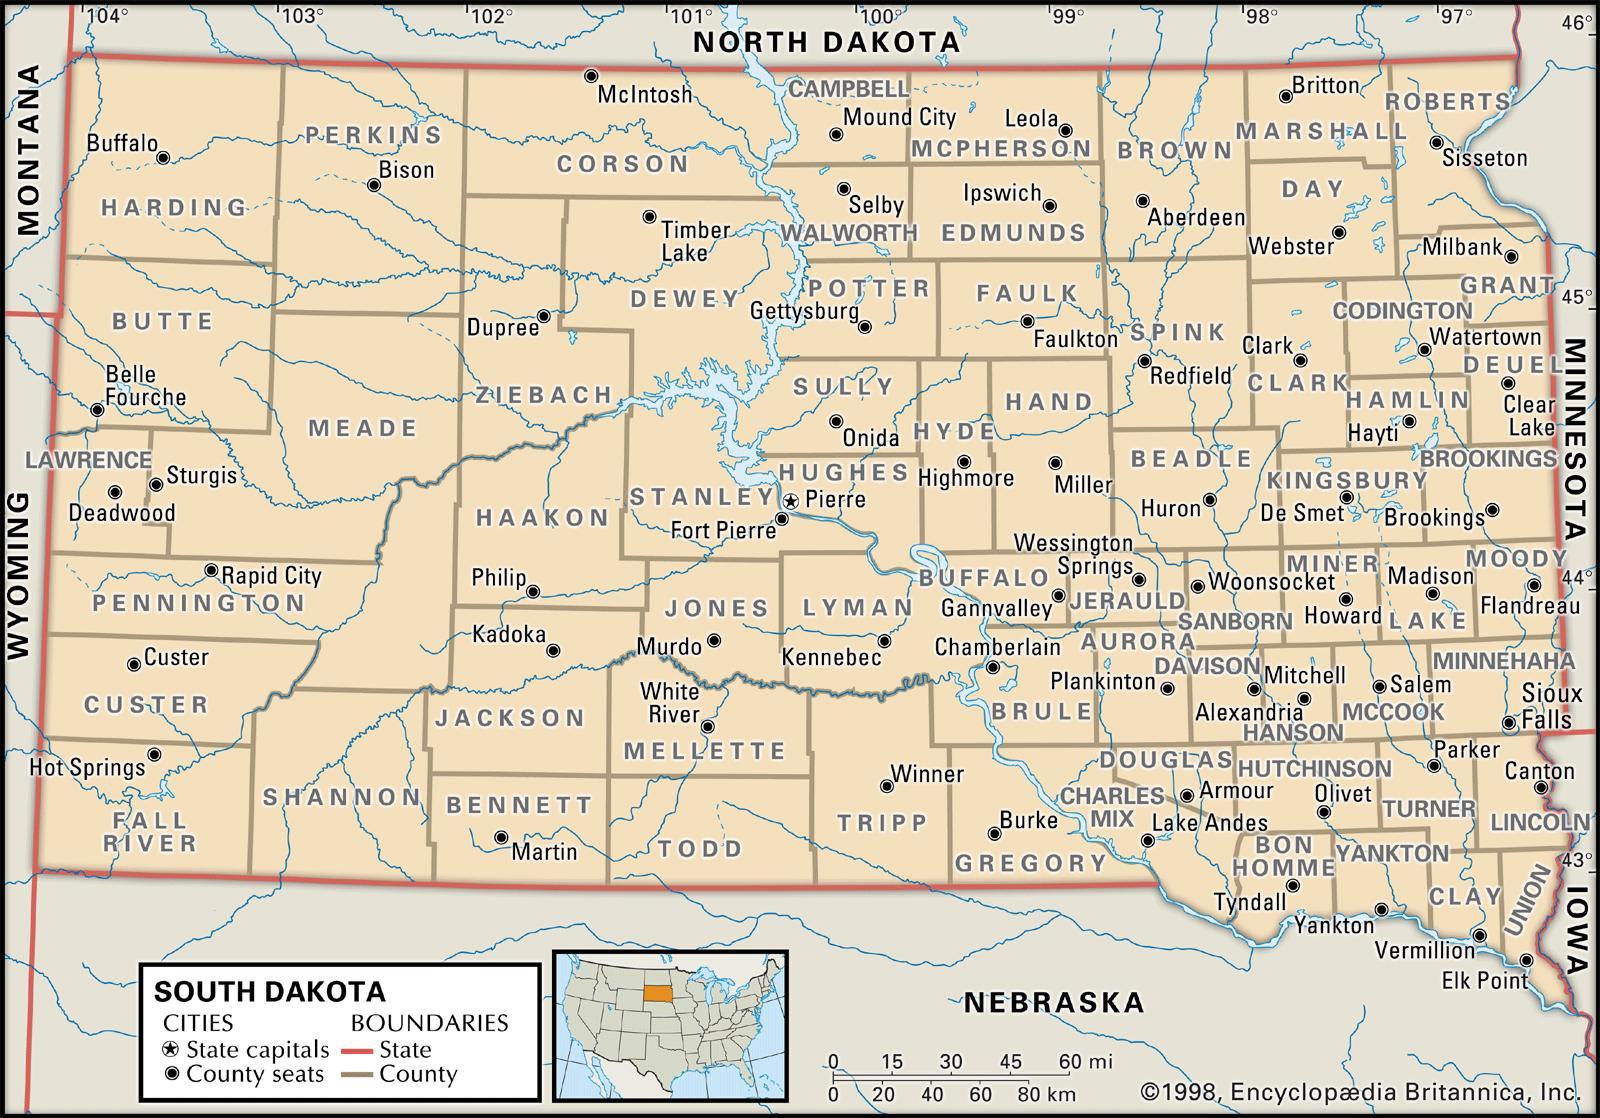 north and south dakota map Old Historical City County And State Maps Of South Dakota north and south dakota map